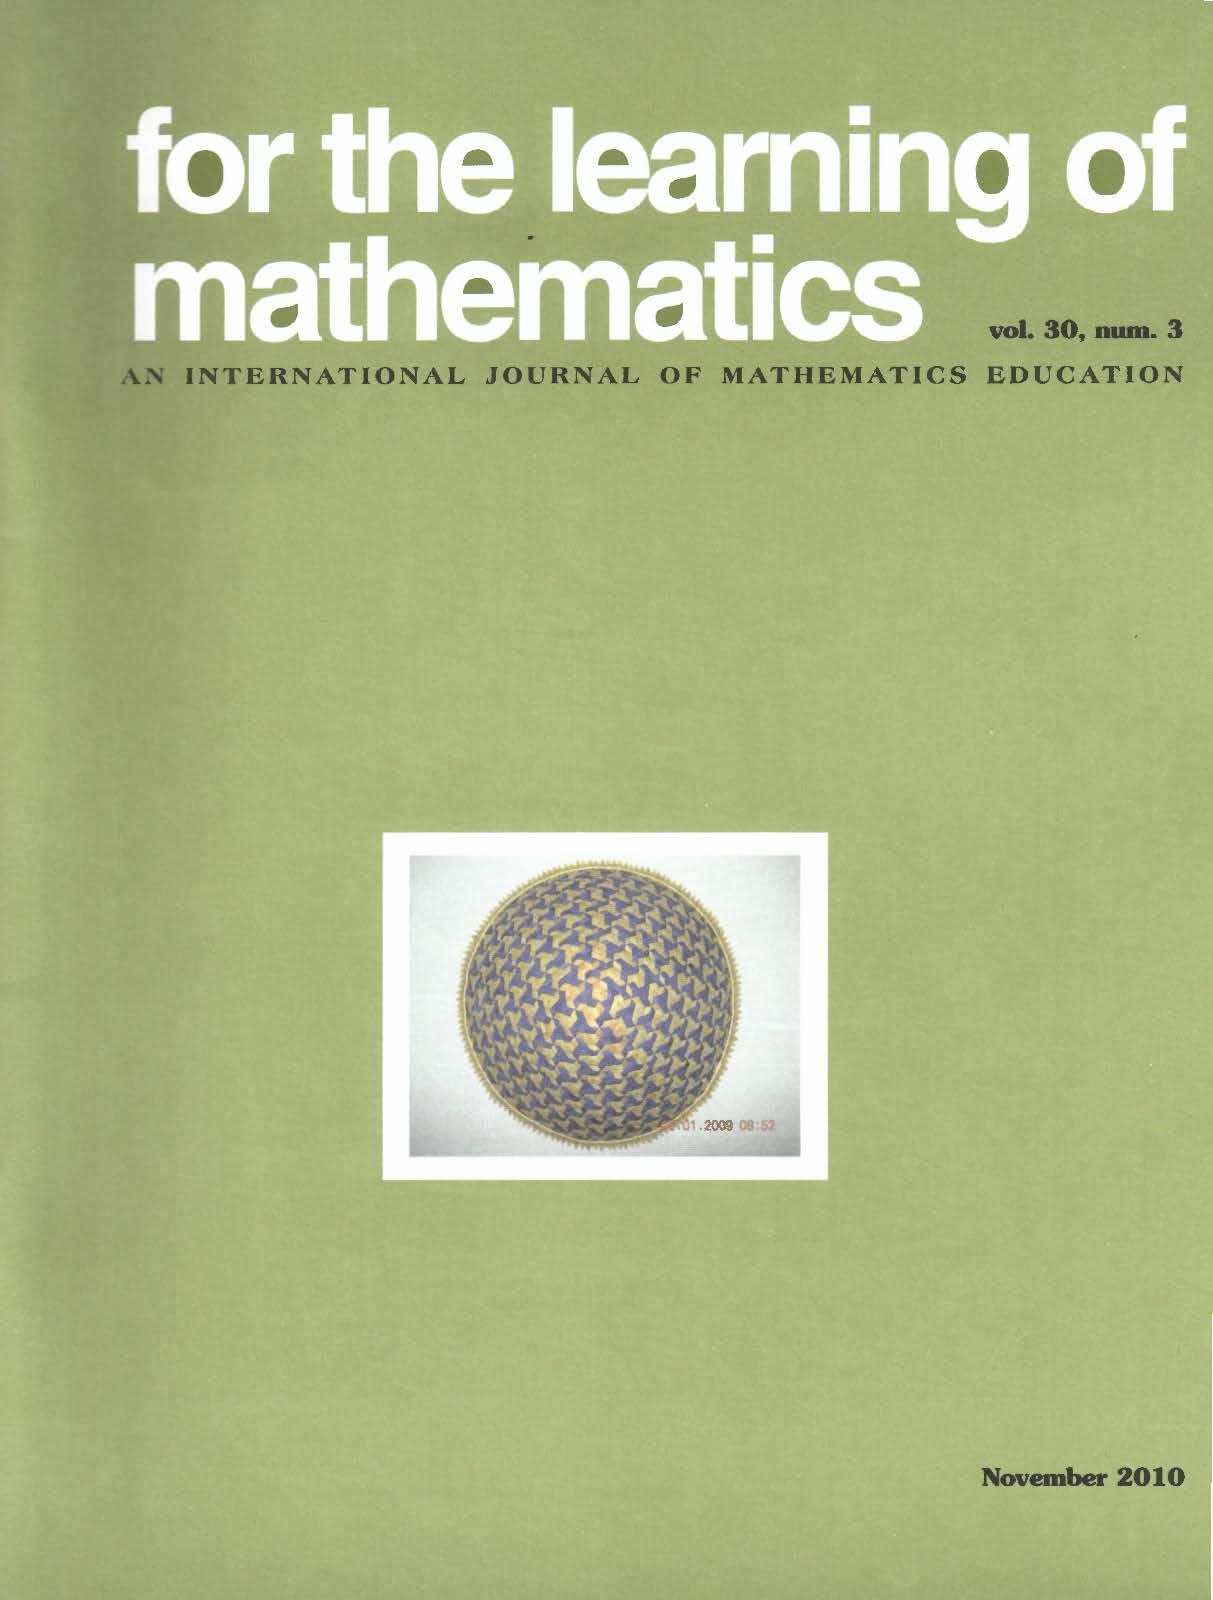 mathematics education dissertation Mathematics theses and dissertations  follow theses/dissertations from 2017 pdf large deviation results for random walks in a sparse random environment, kubilay.